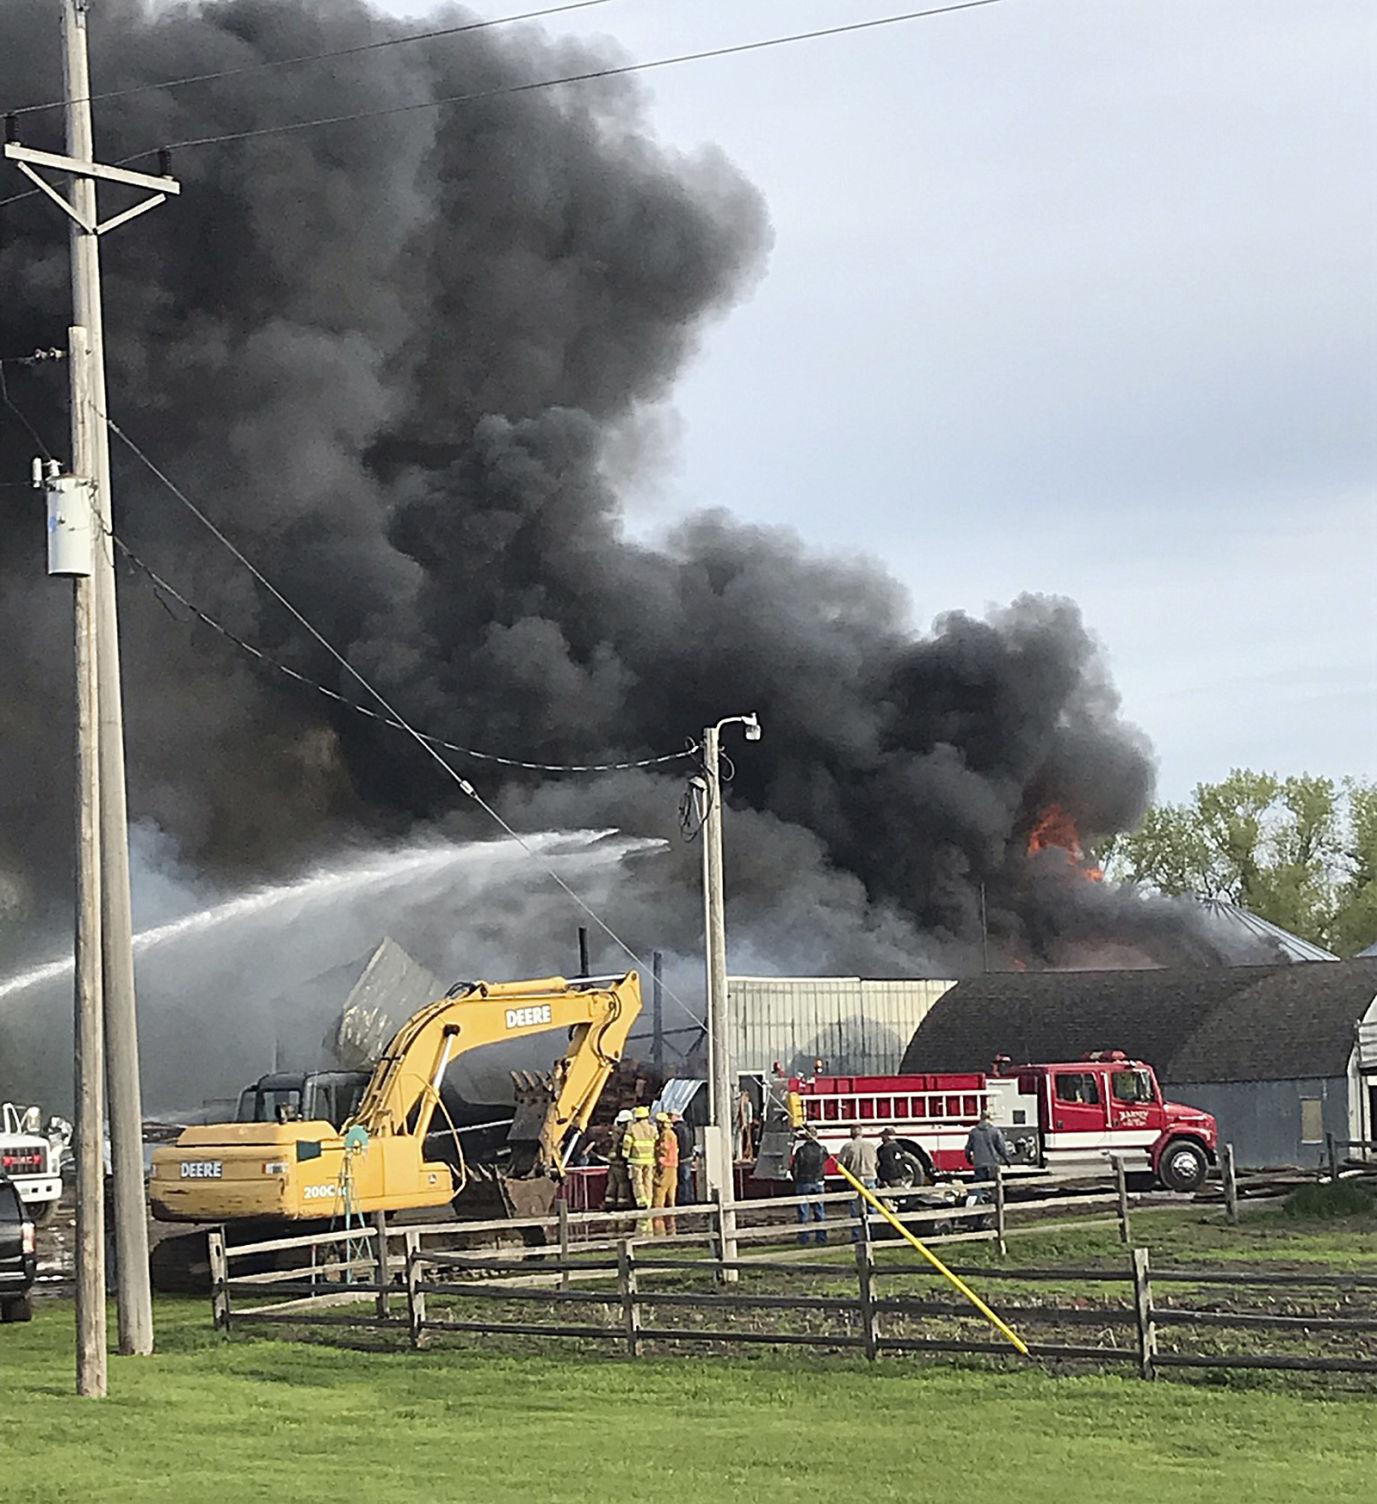 Shop catches fire again